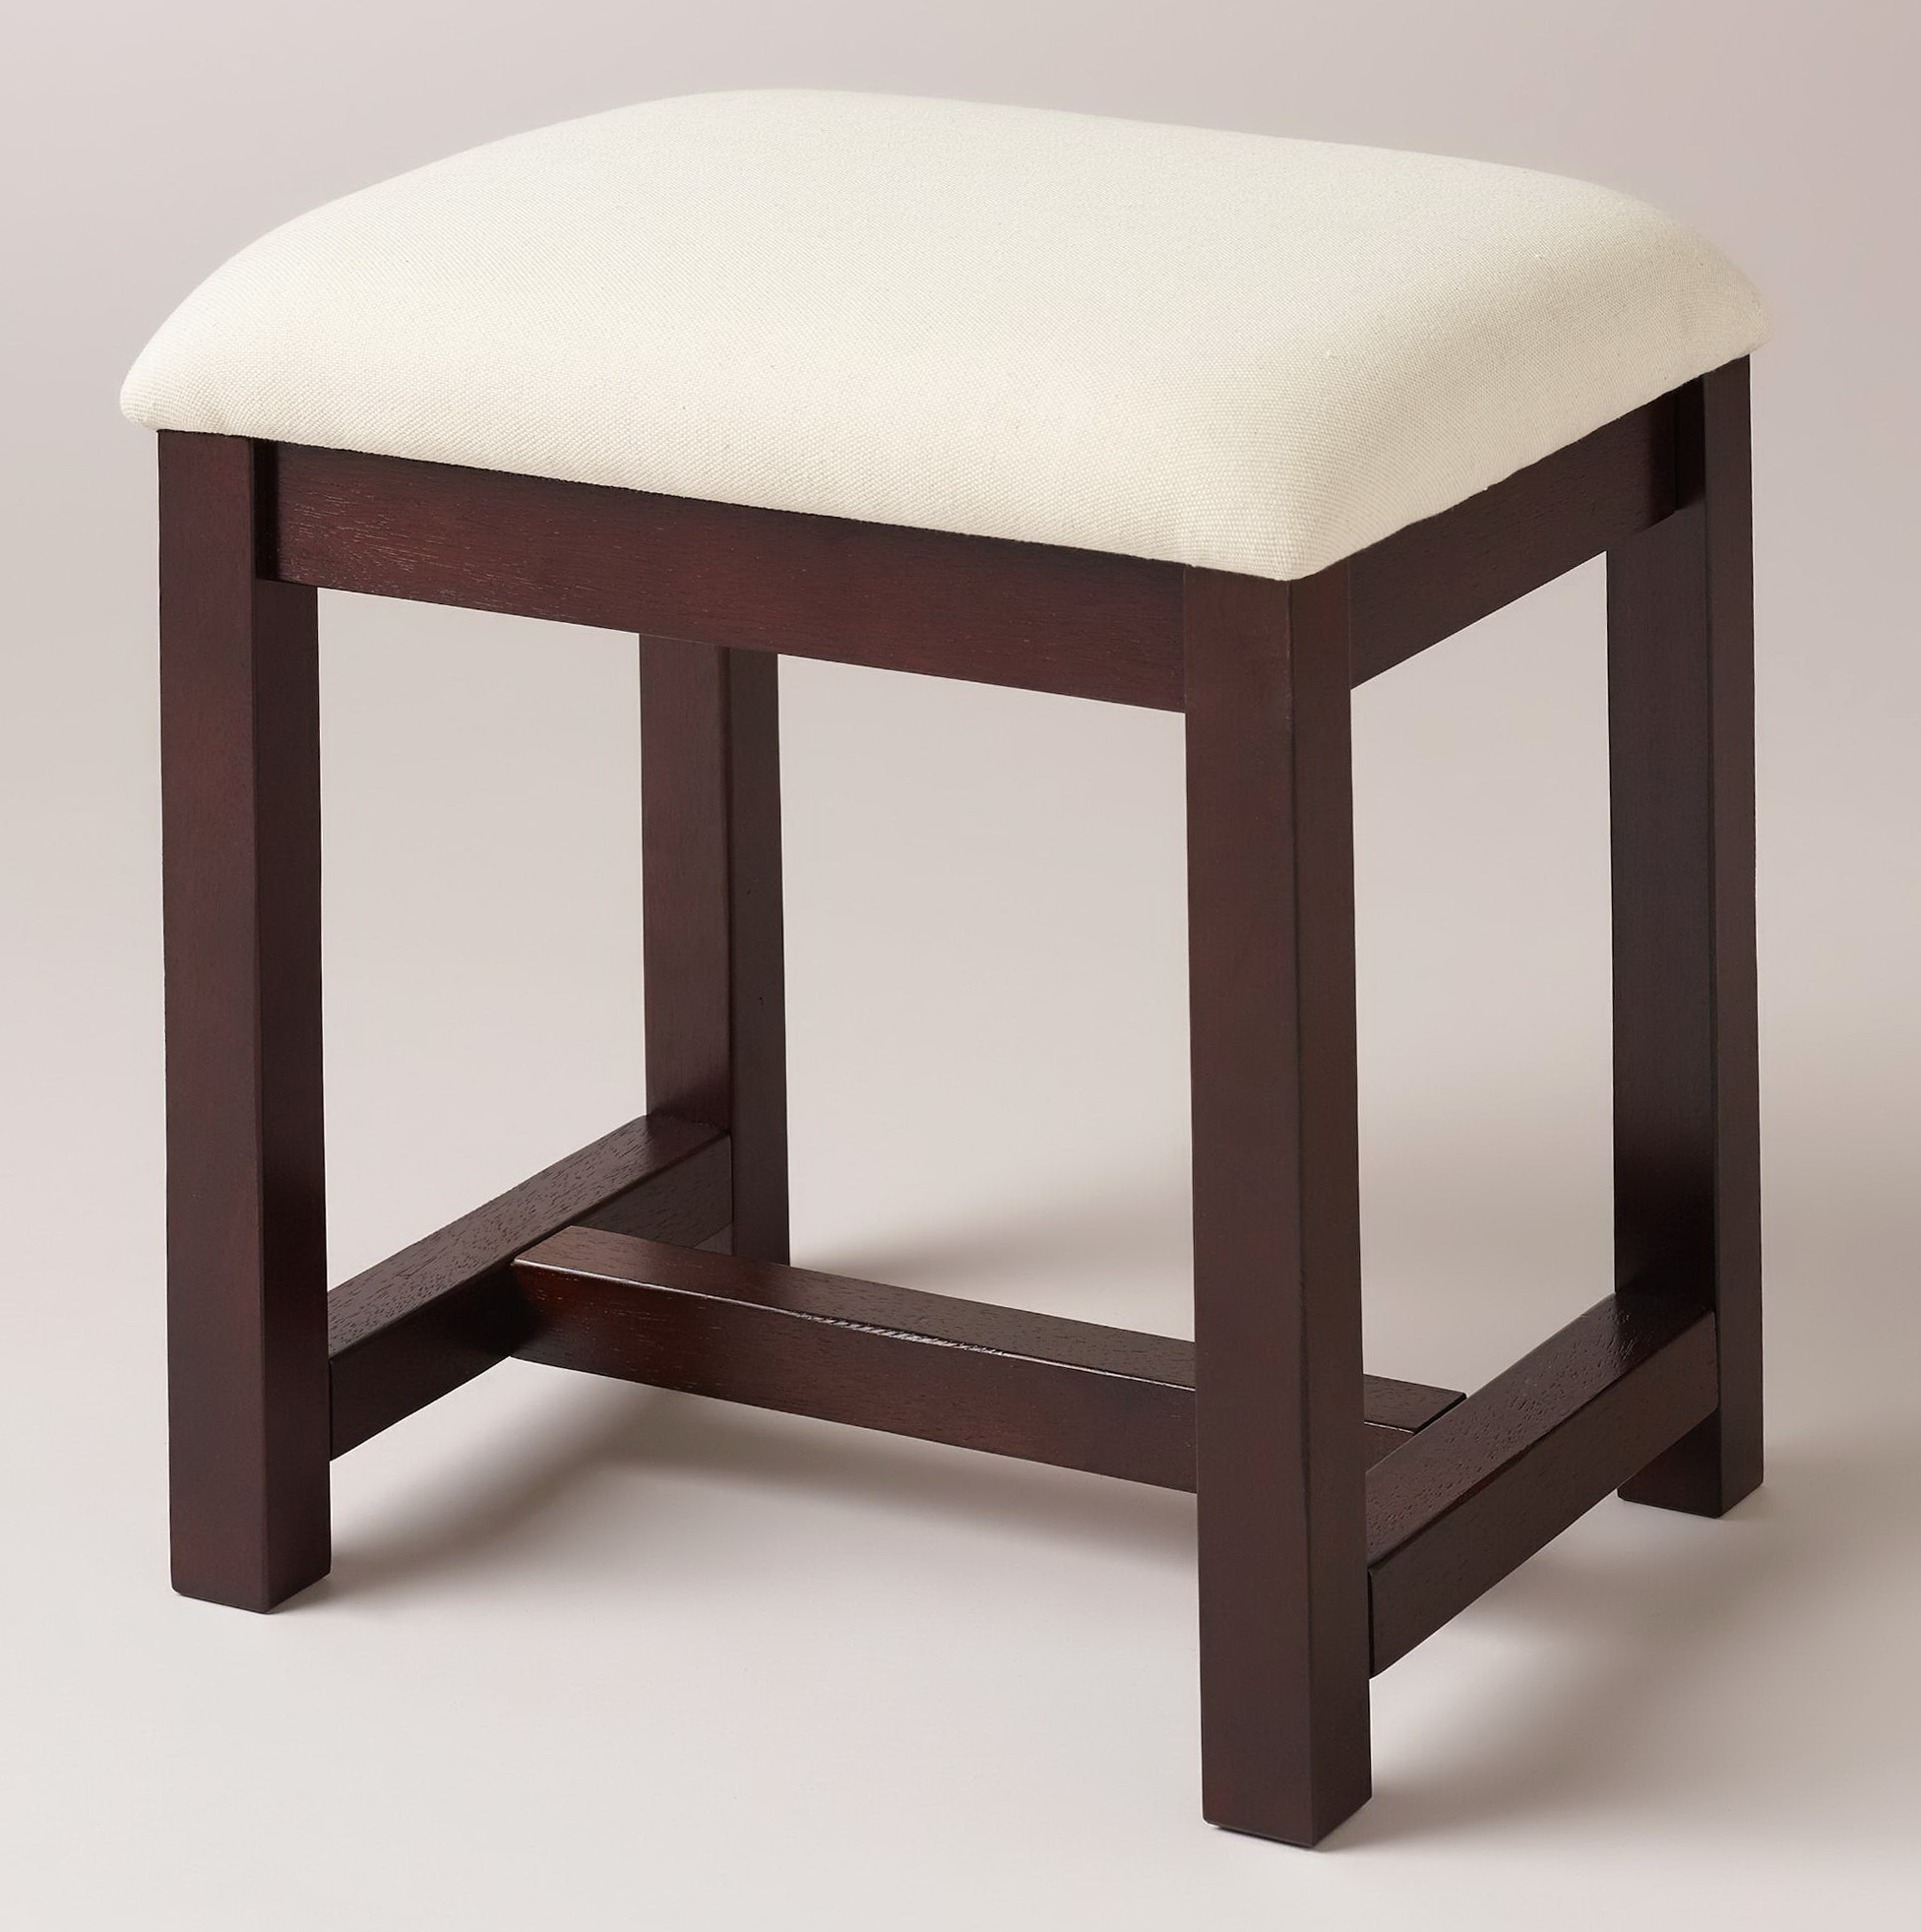 Bar Stool Cushions Target Home Design Ideas : bar stool cushions target from www.zintaaistars.com size 1952 x 1963 jpeg 564kB